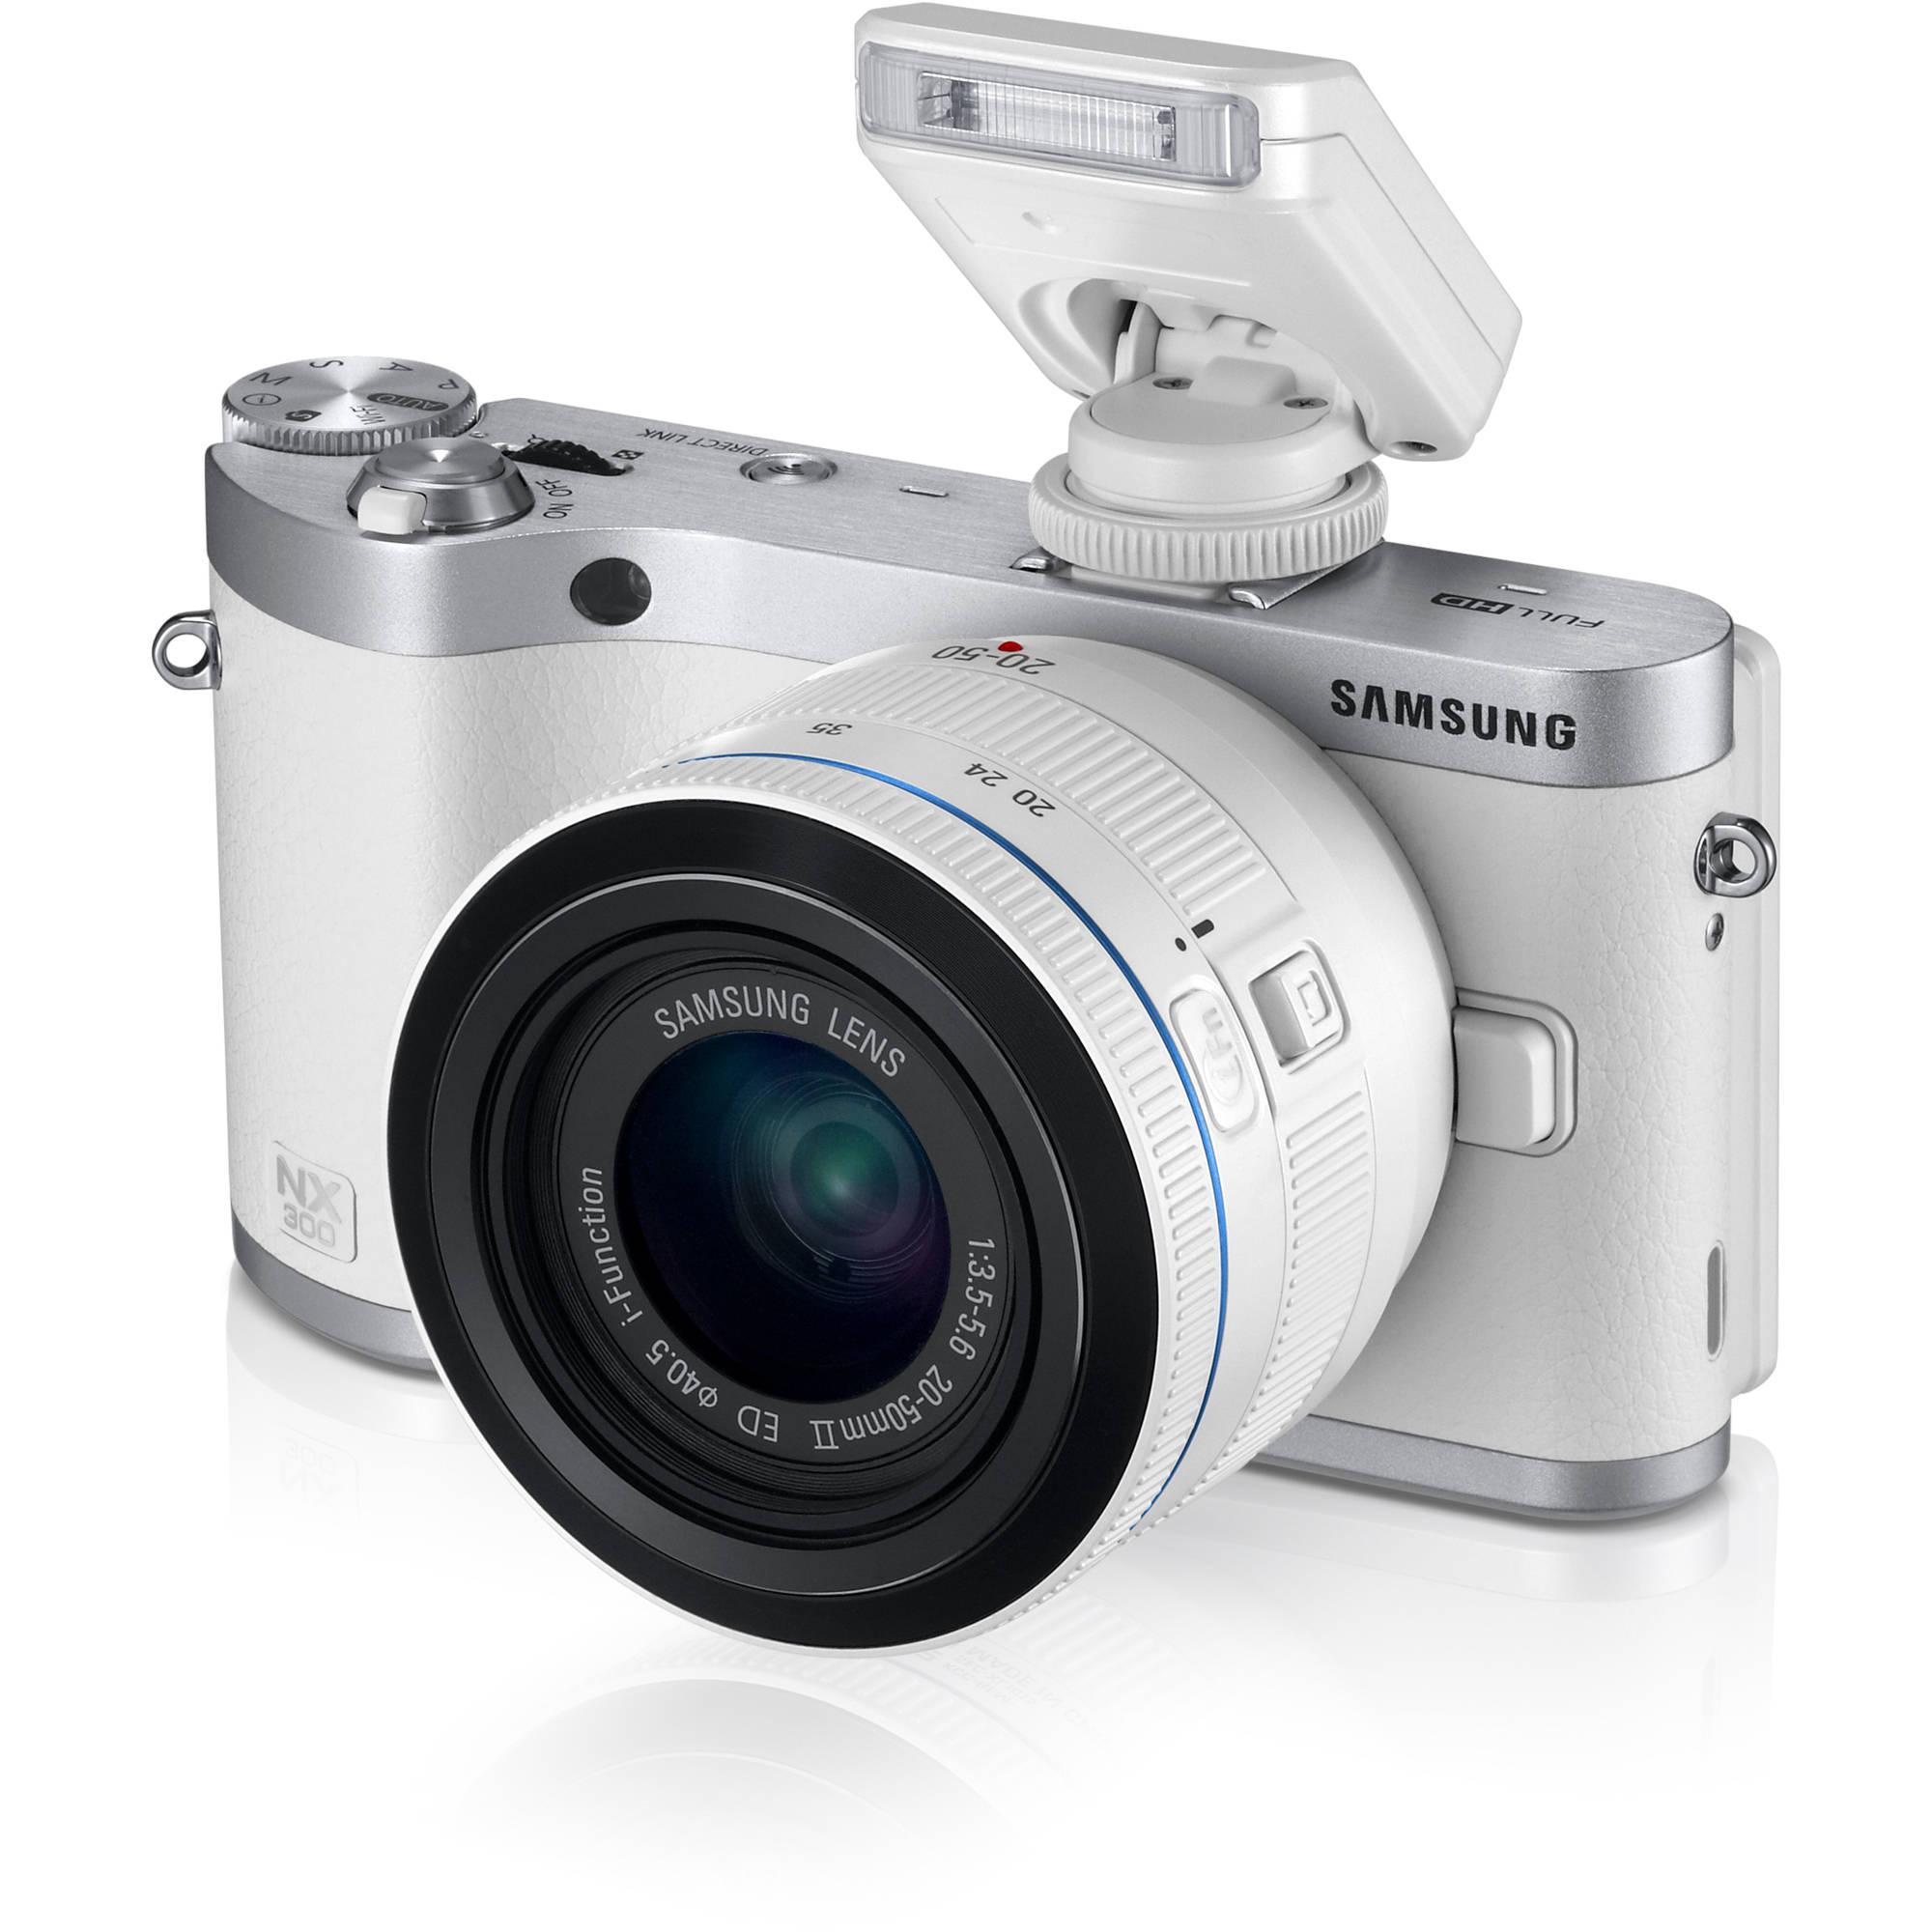 Samsung Nx300 Mirrorless Digital Camera Ev Nx300zbfuus Bh Photo Sony 6000 With Lensa 16 50 Mm F 35 56 Limited 20 50mm Ed Ii